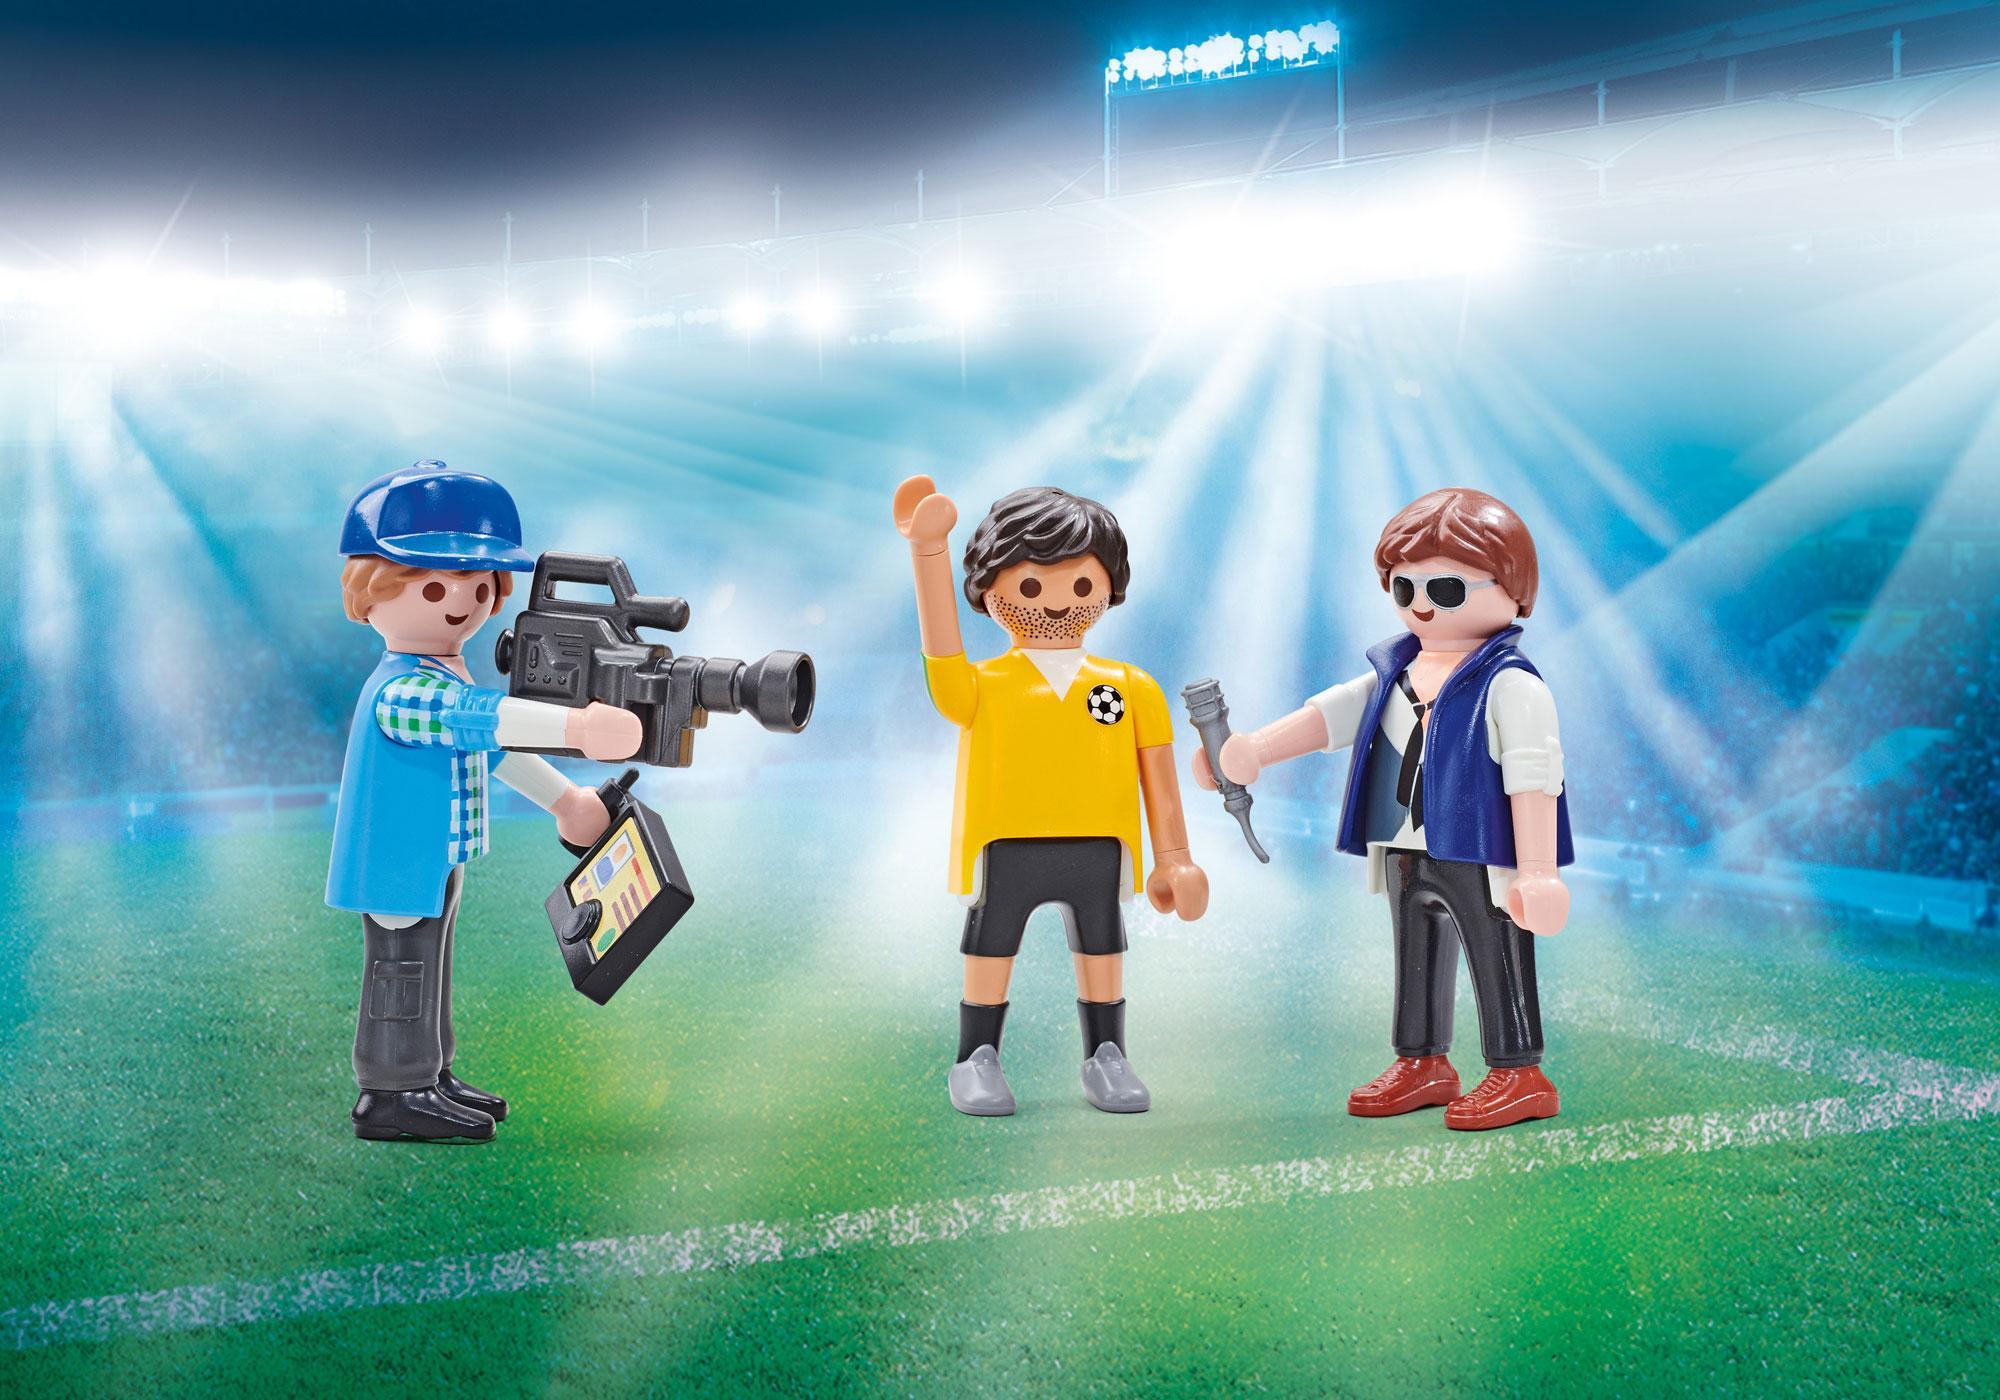 9825_product_detail/Intervista al calciatore